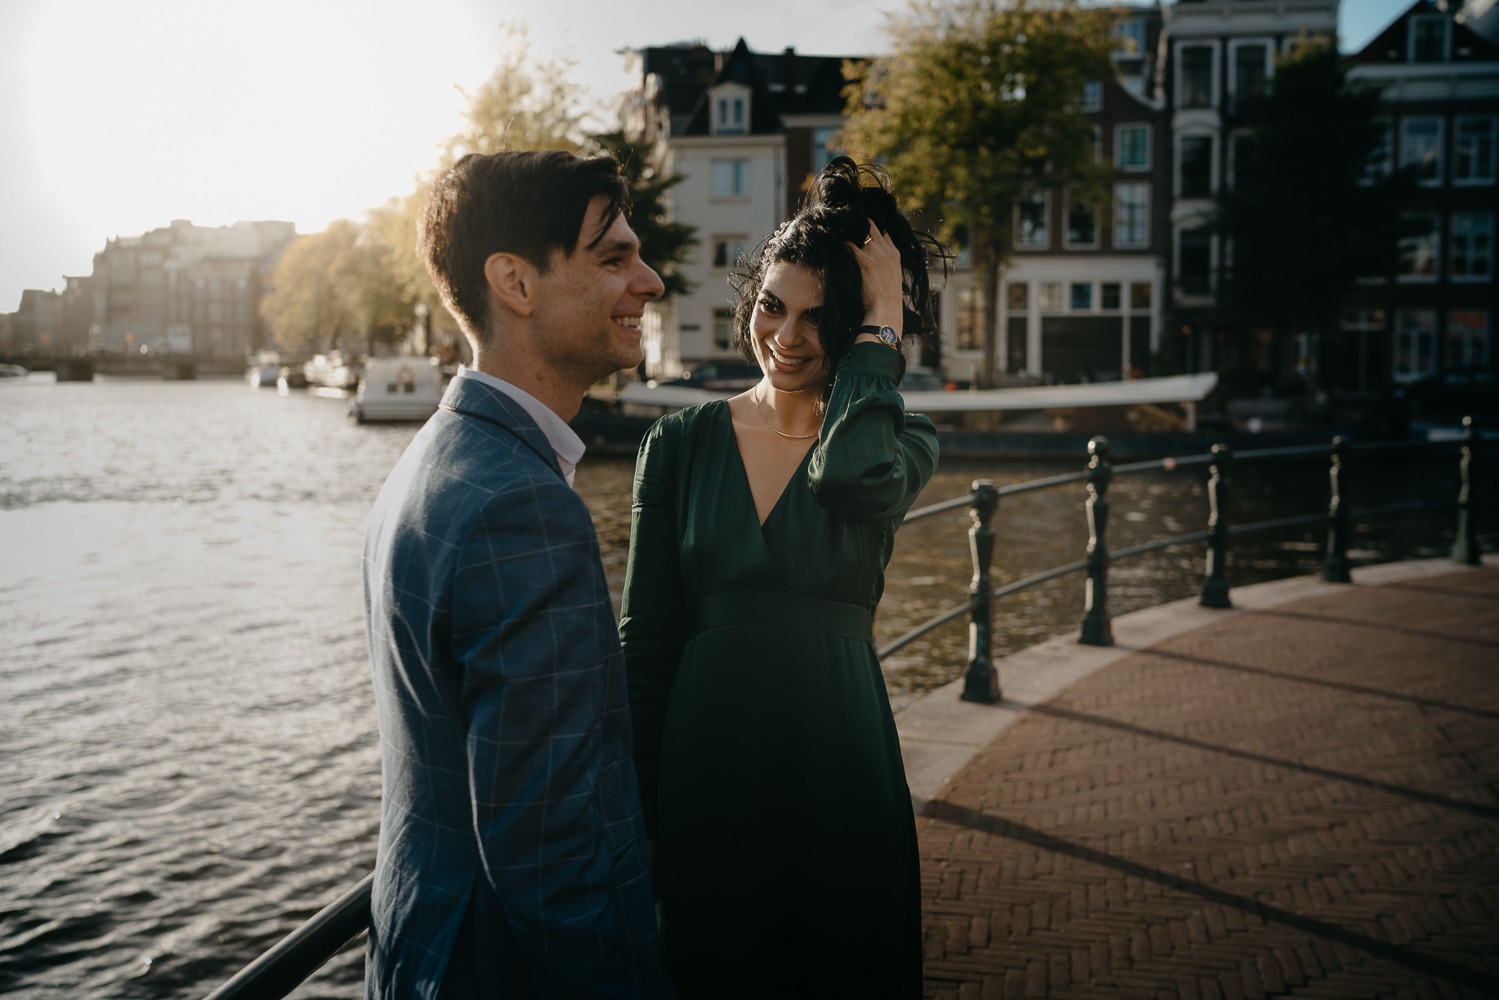 verlovings fotoshoot in amsterdam fotograaf mark hadden